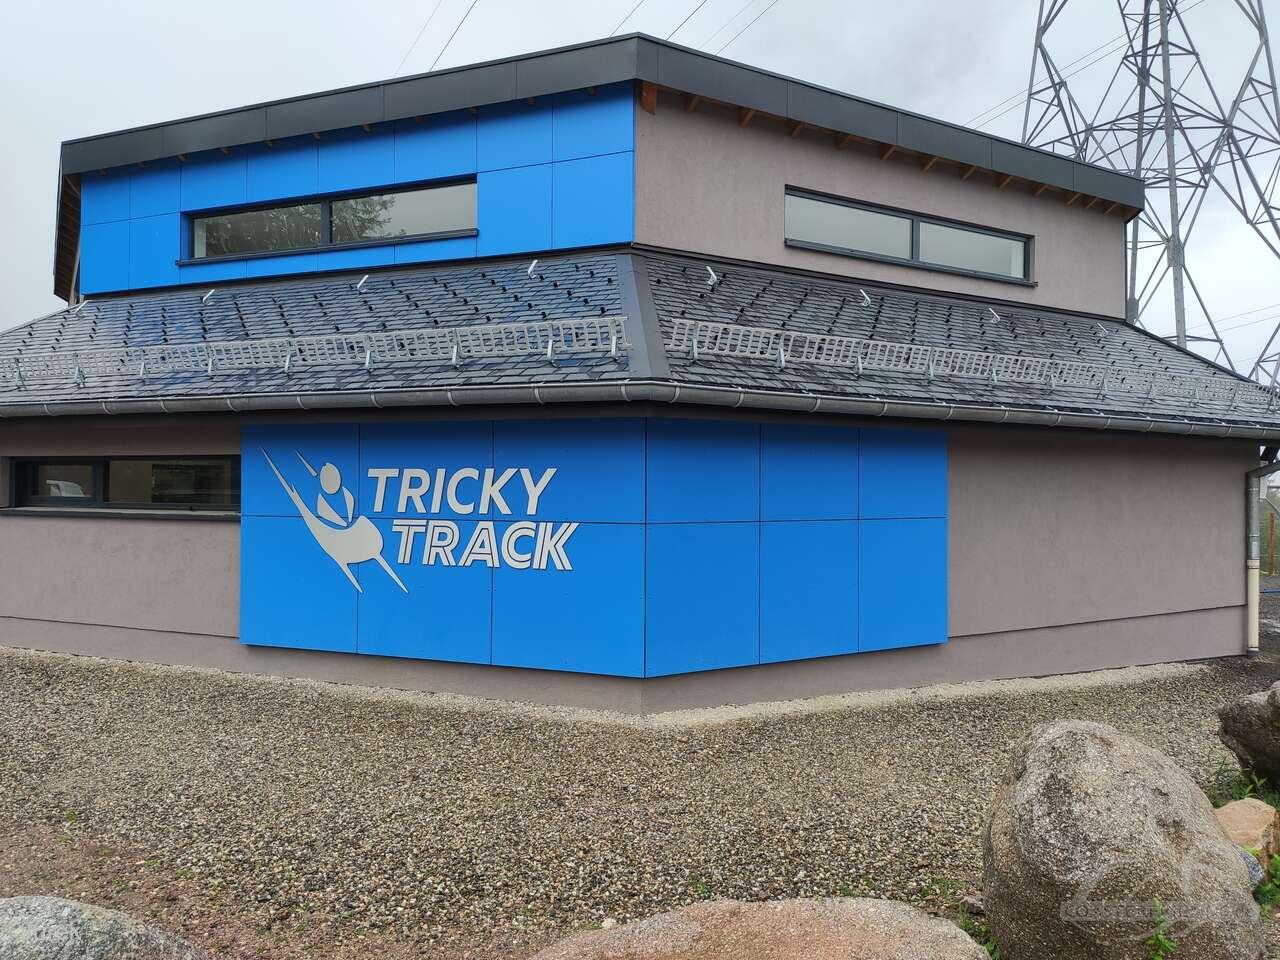 Tricky Track Impressionen